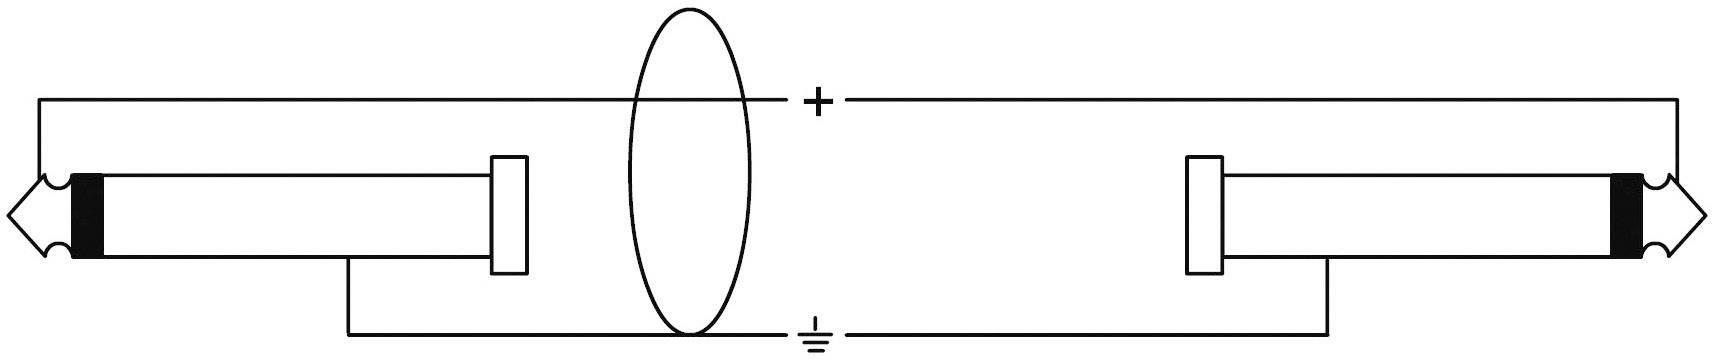 Kabel Cordial CPL 20 PP 25, [1x jack zástrčka 6,3 mm - 1x jack zástrčka 6,3 mm], 20 m, černá